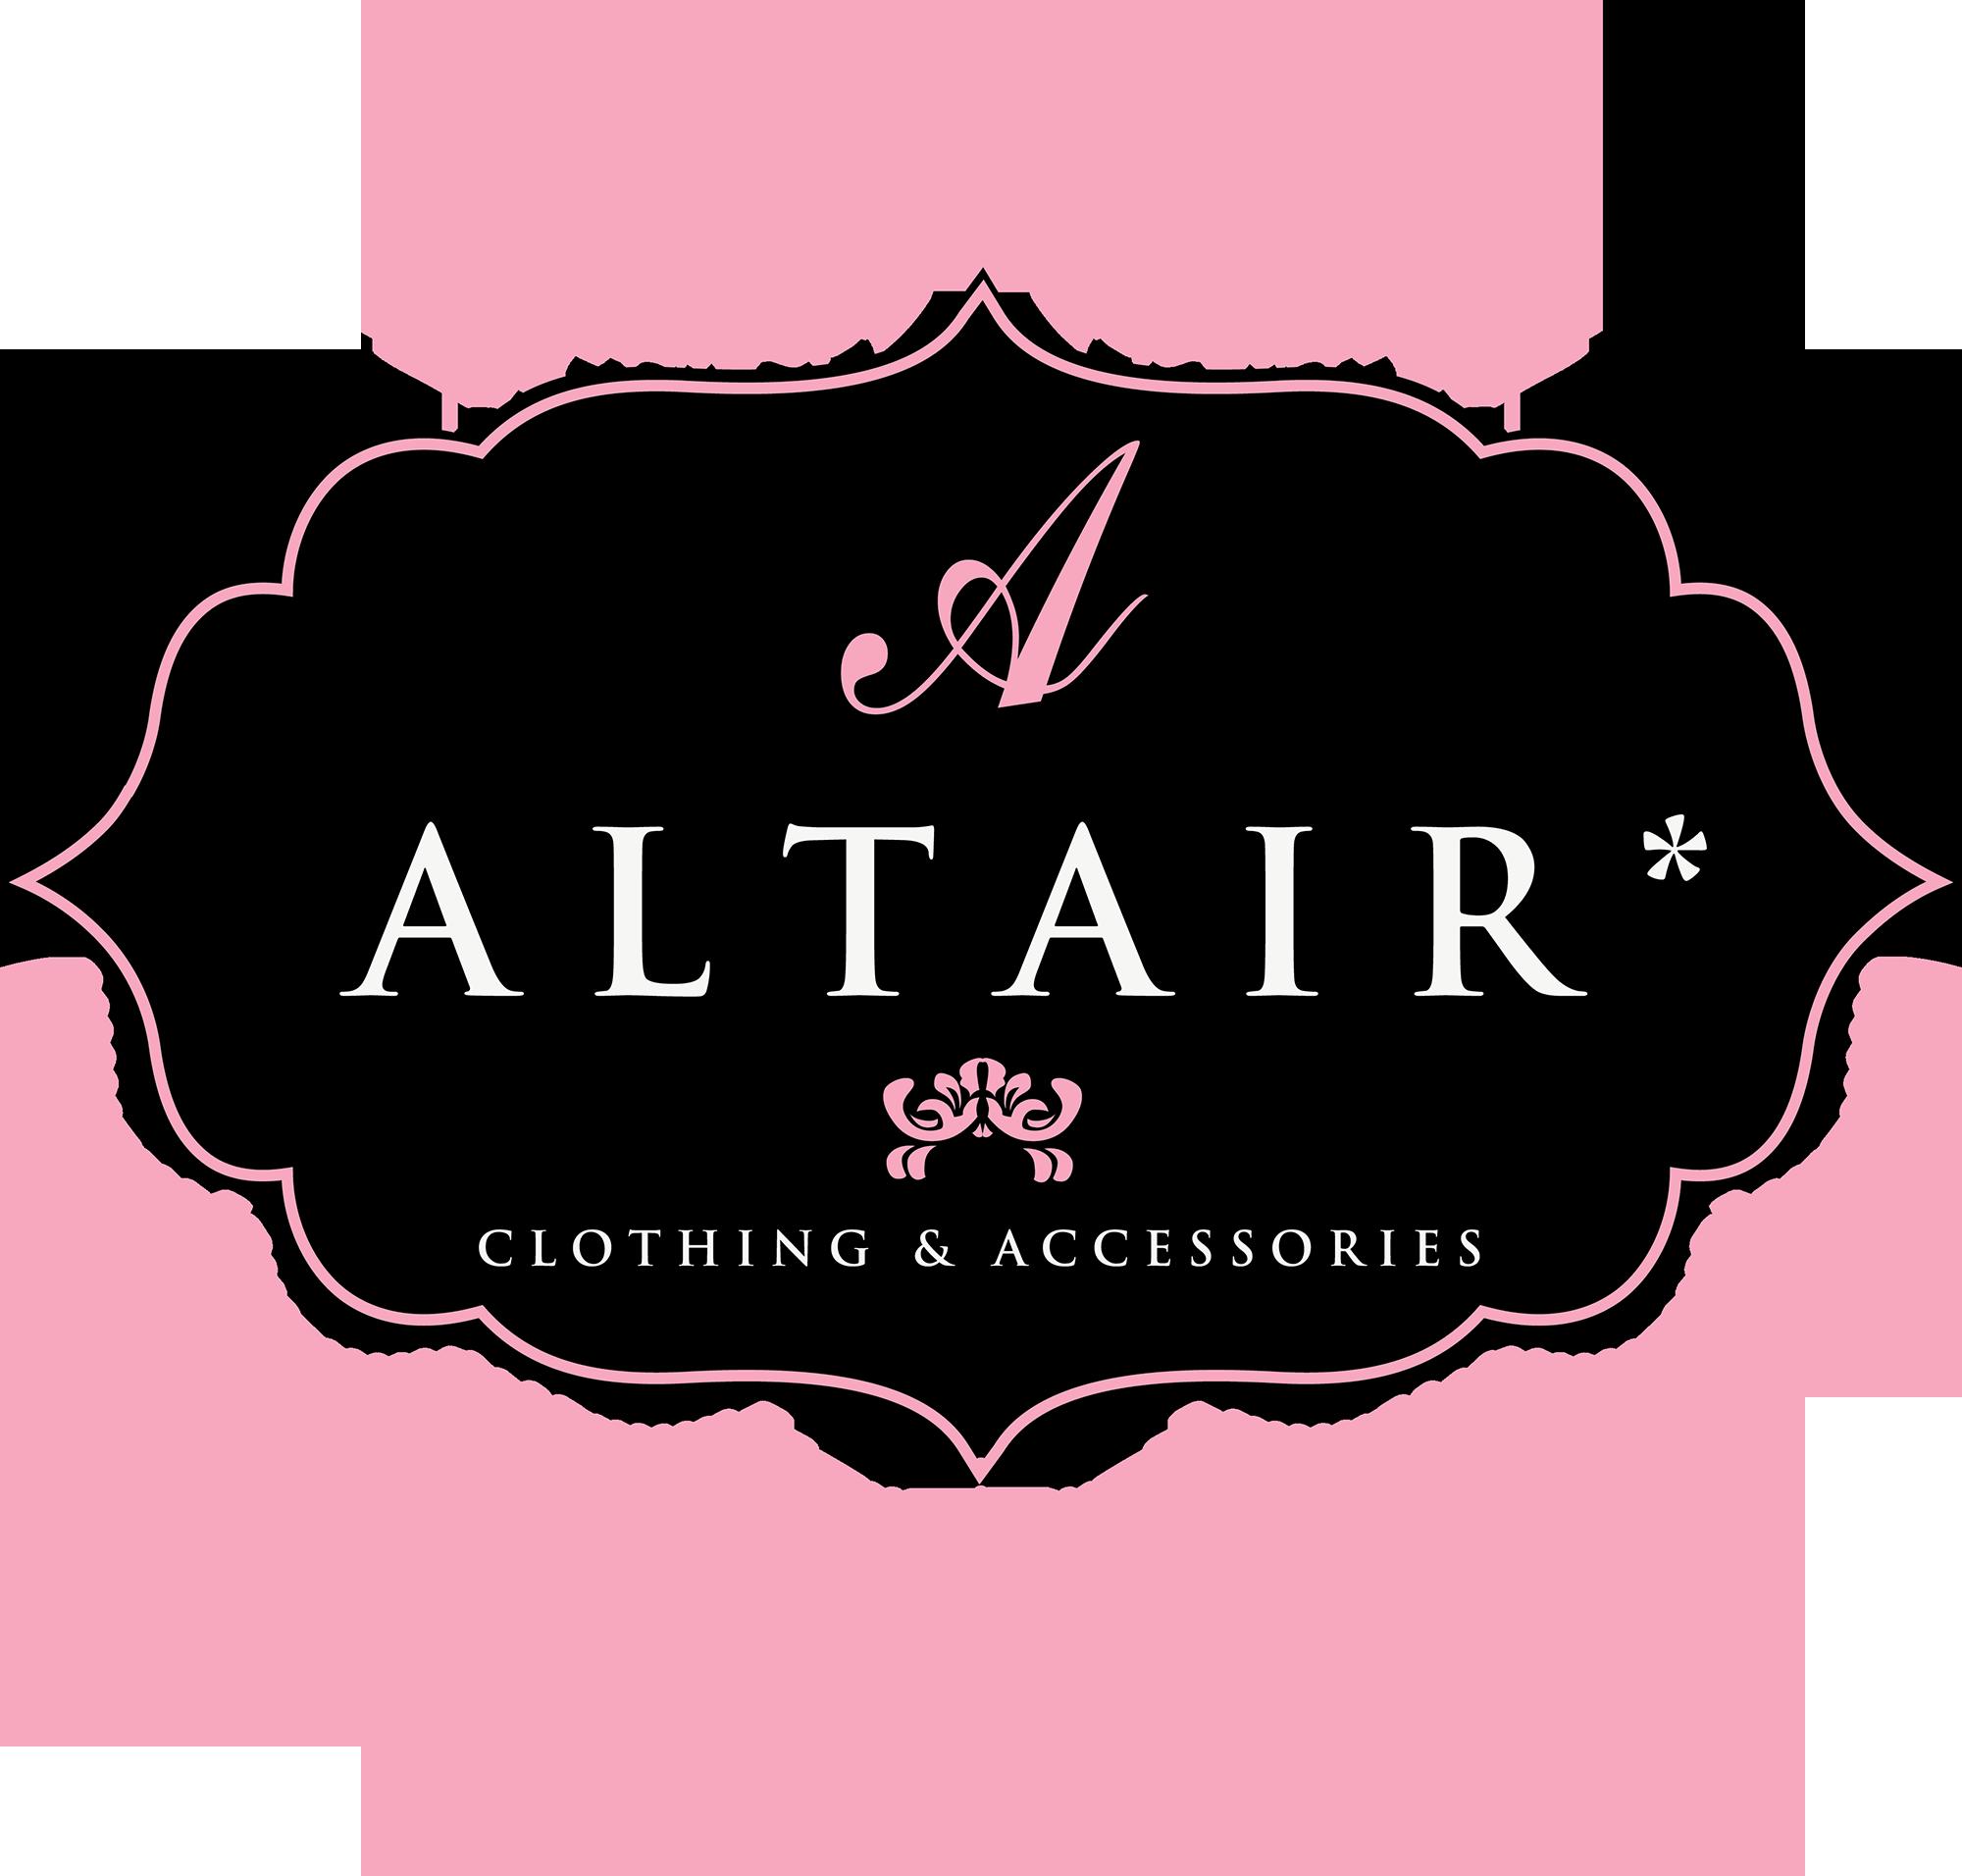 ALTAIR*